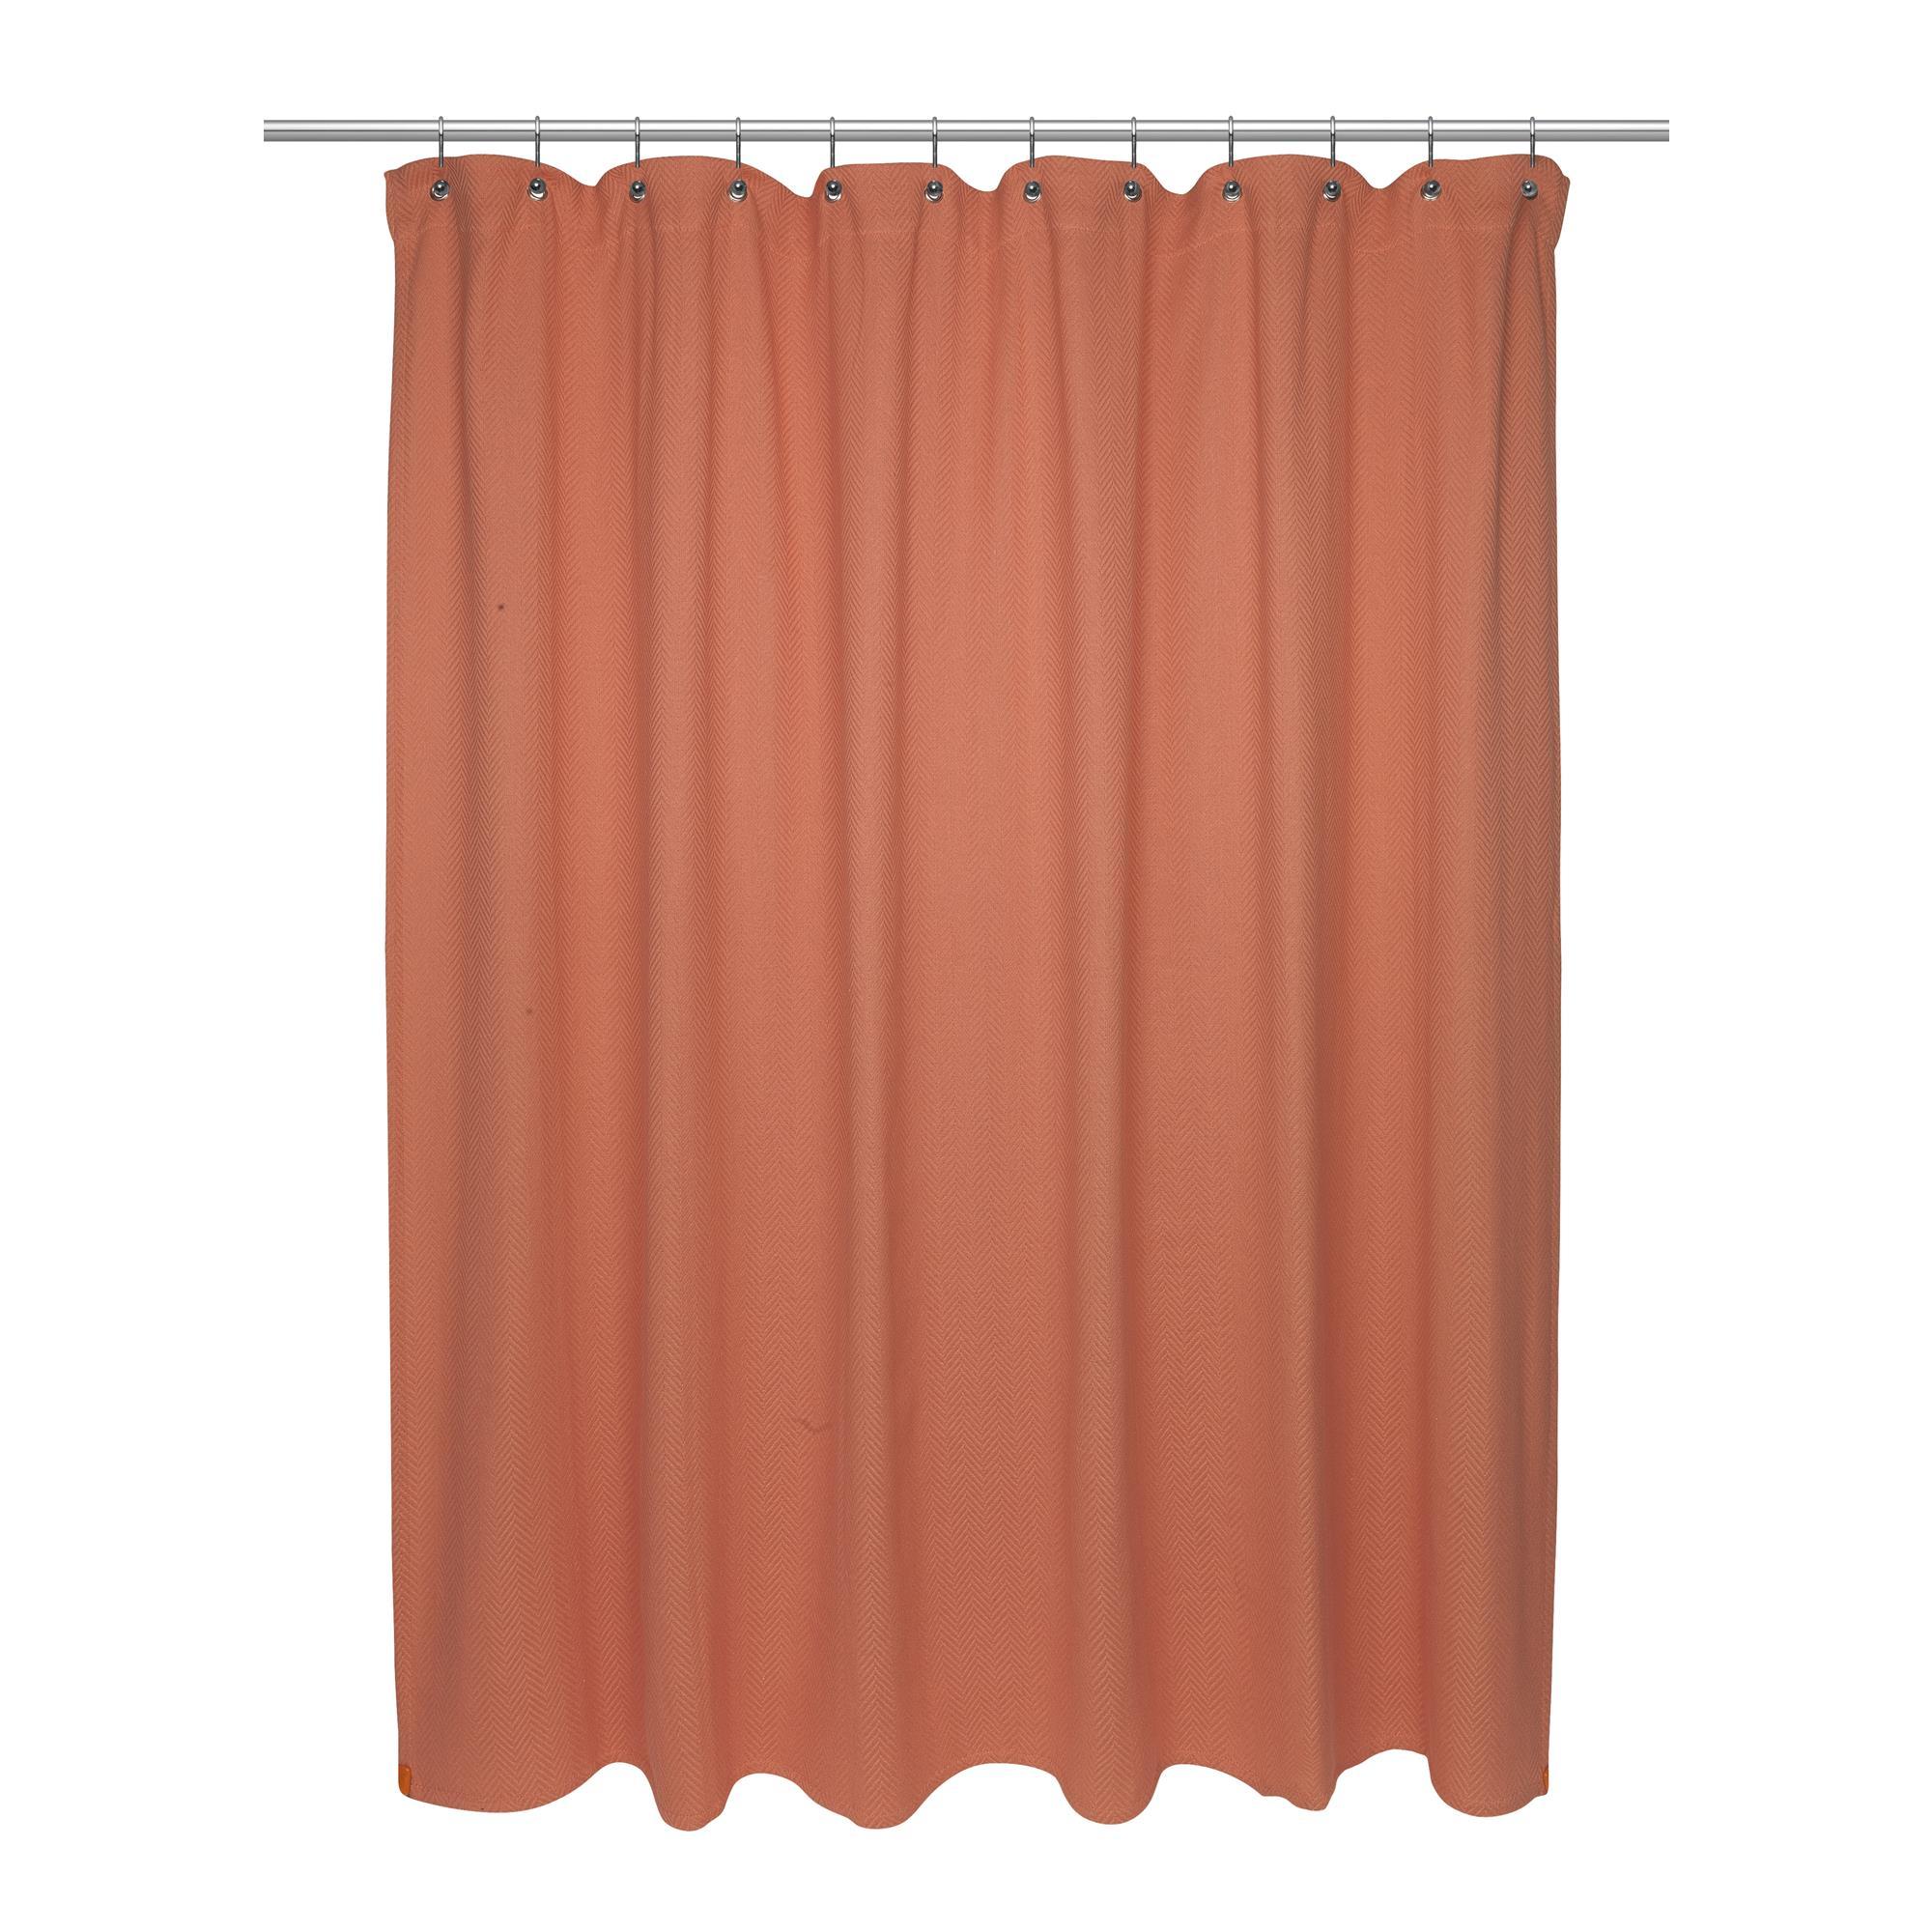 Carnation Standard Size 100 Cotton Chevron Weave Shower Curtain